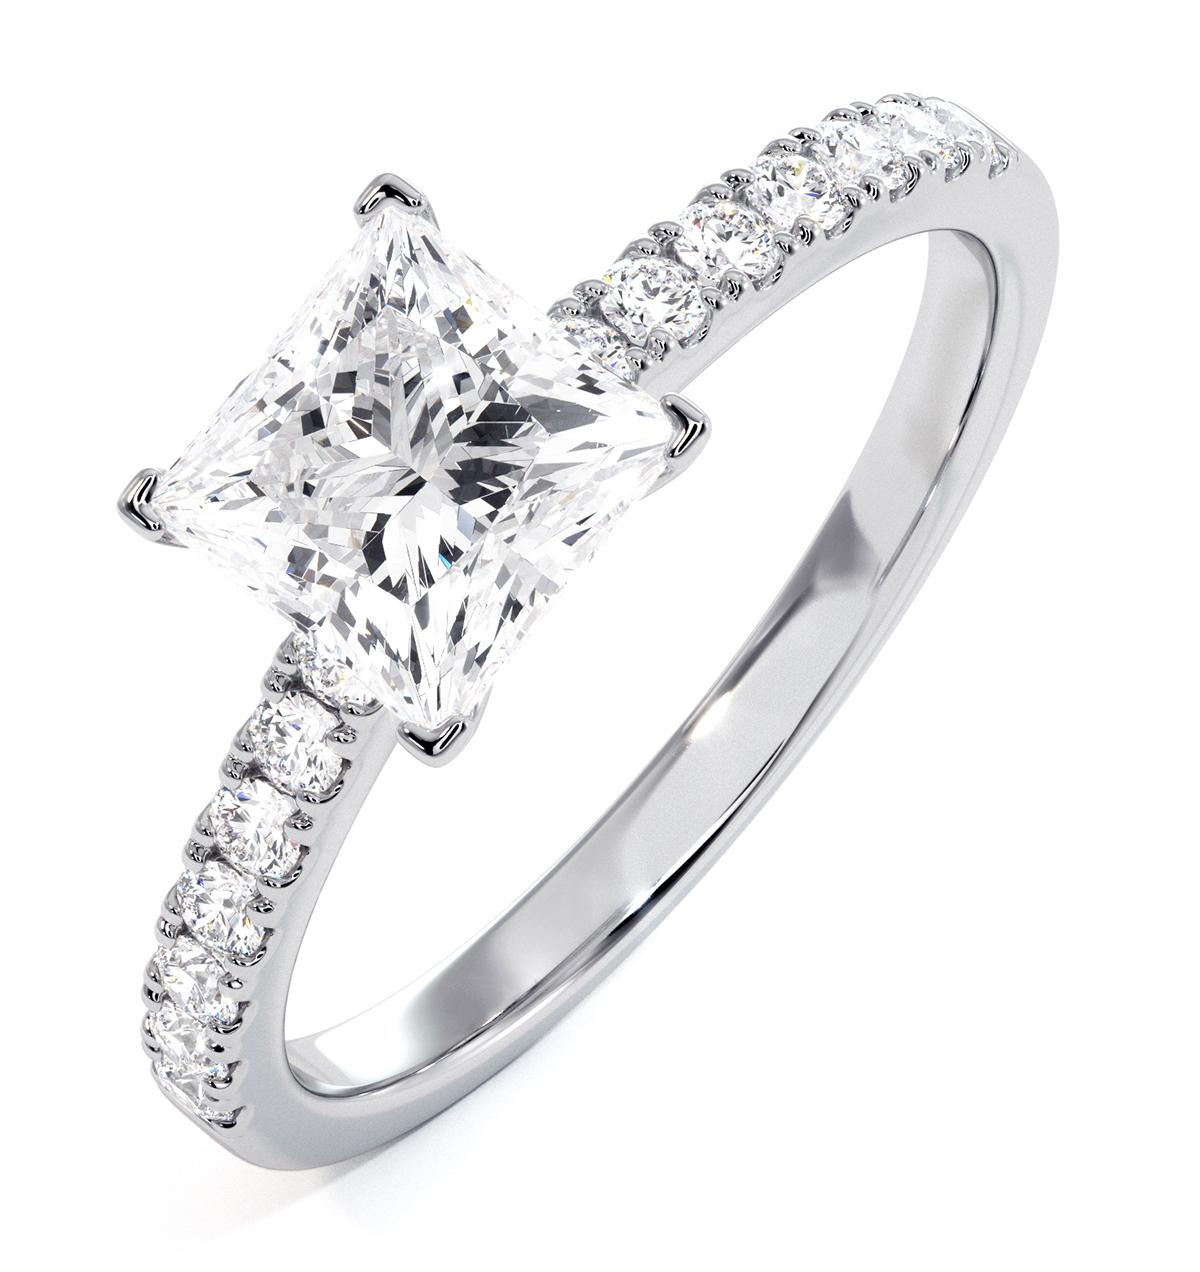 Katerina GIA Princess Diamond Engagement Ring 18KW Gold 1.55ct G/VS1 - image 1